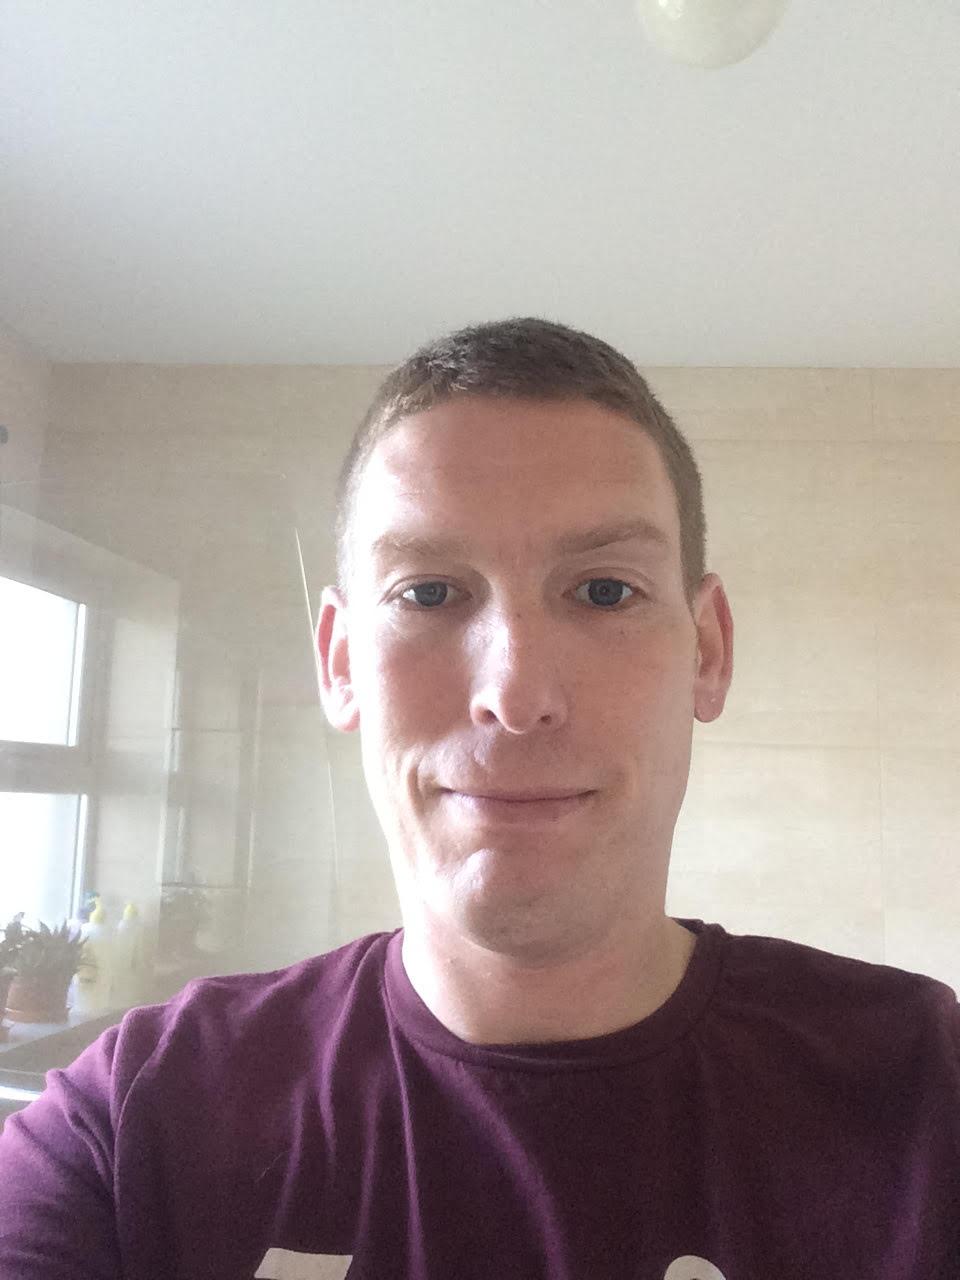 After the 1st shave..... feeling apprehensive